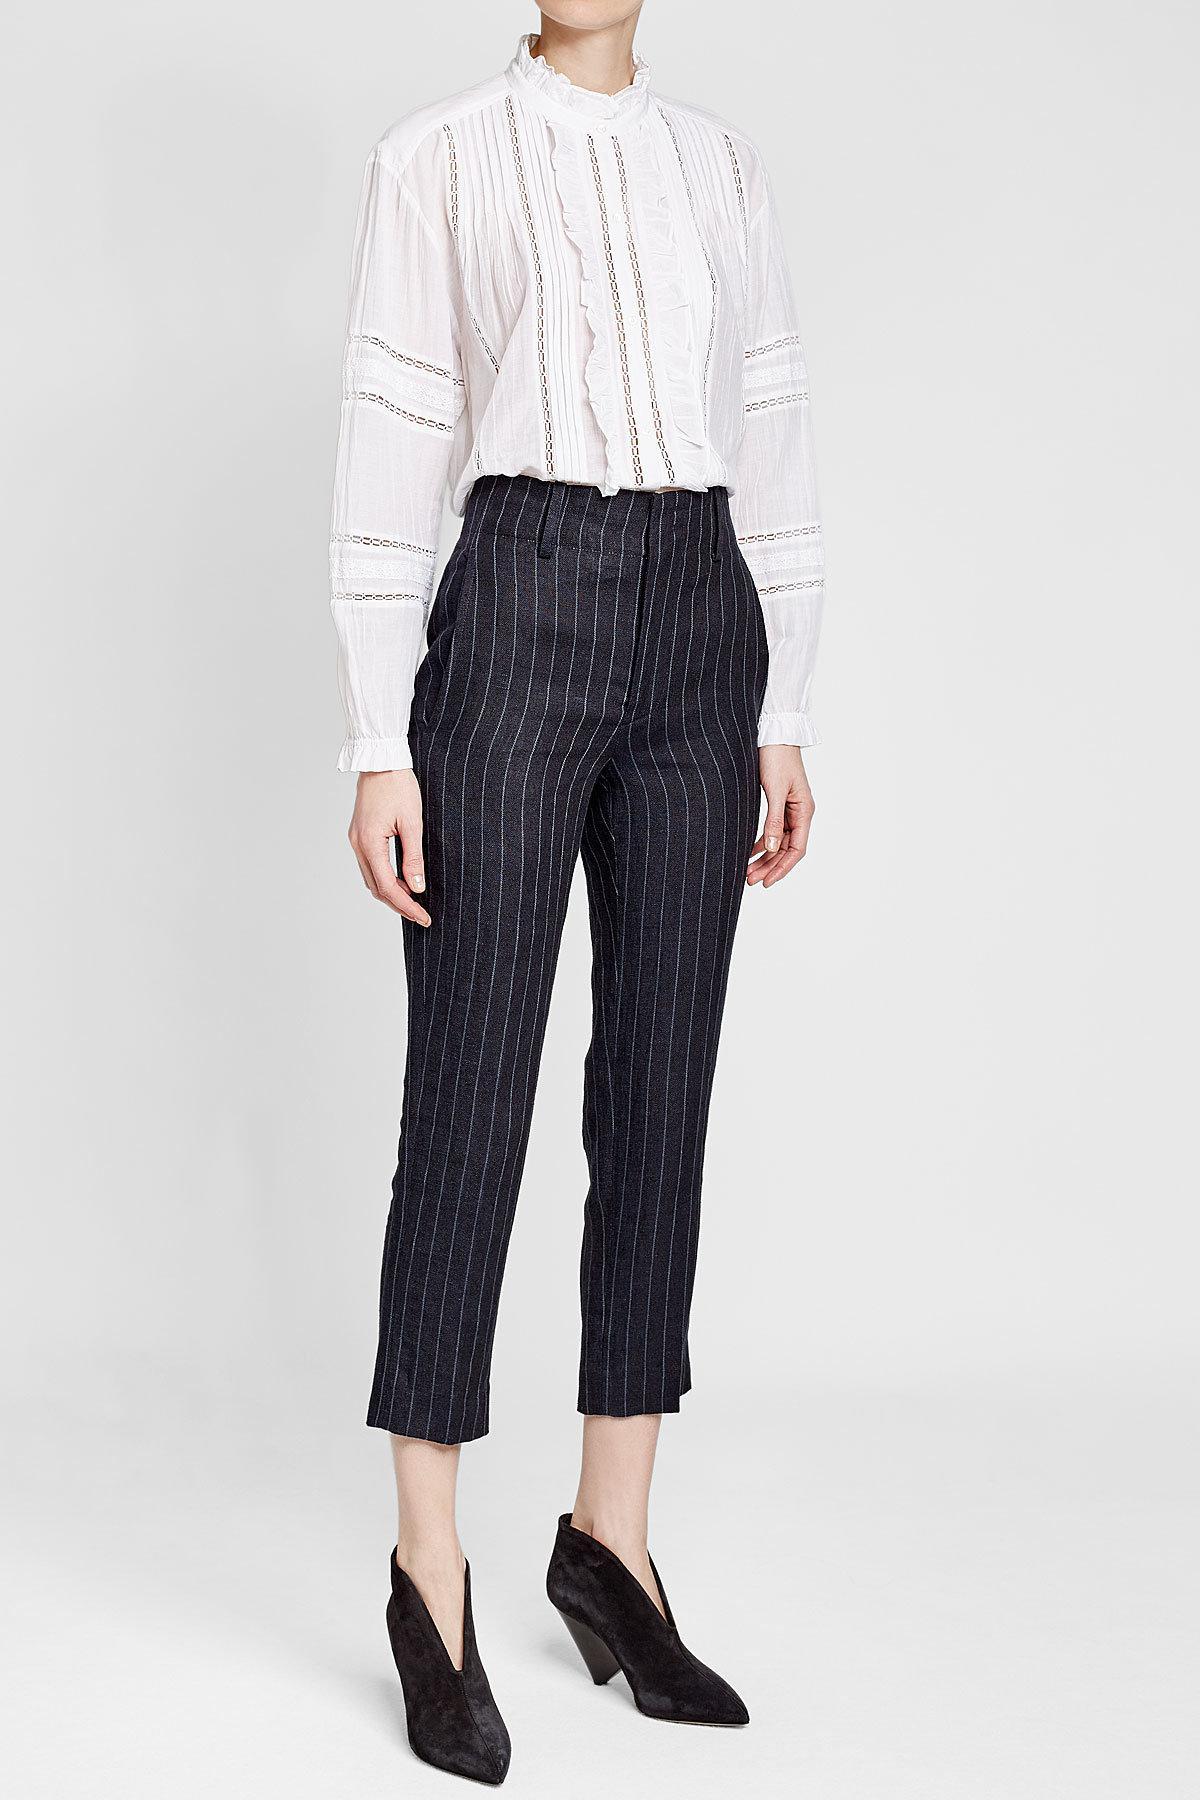 Idini linen trousers Isabel Marant Hf4BKk4eH